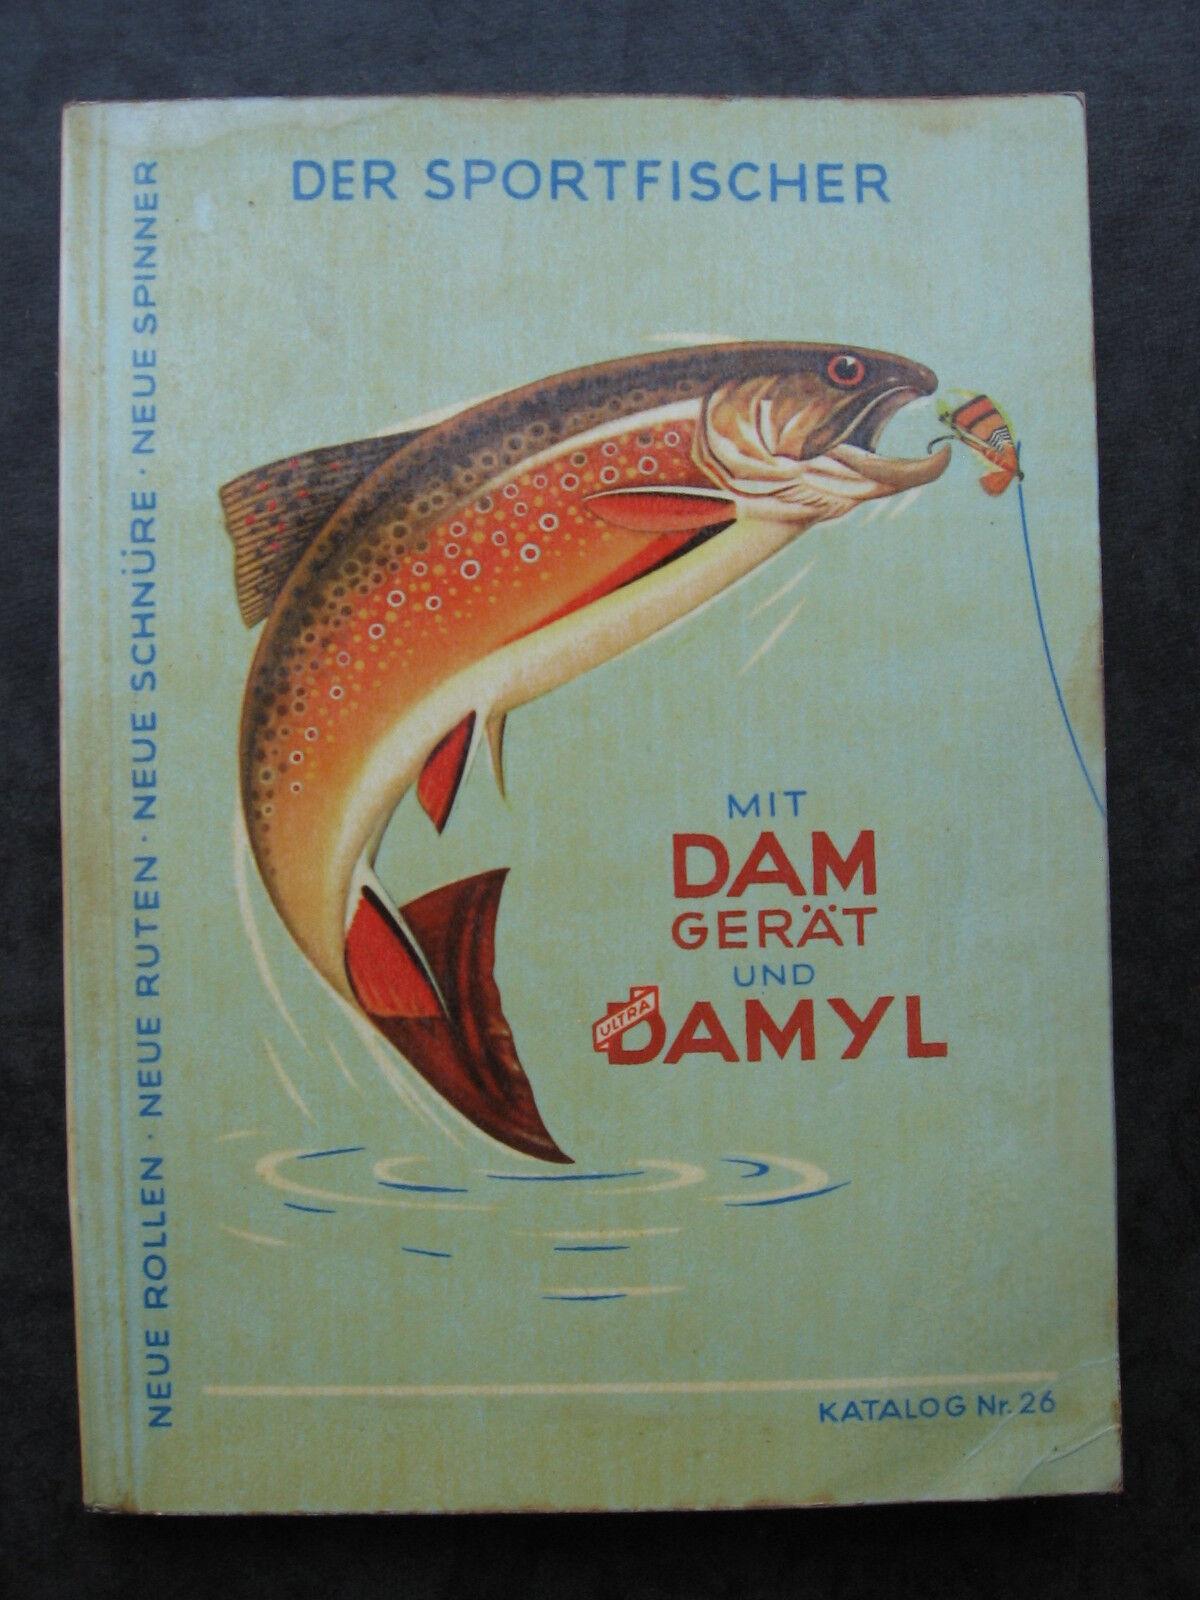 DAM DAMYL Angelgeräte Katalog Nr.26 Angelkatalog von 1958 Angelgerätekatalog